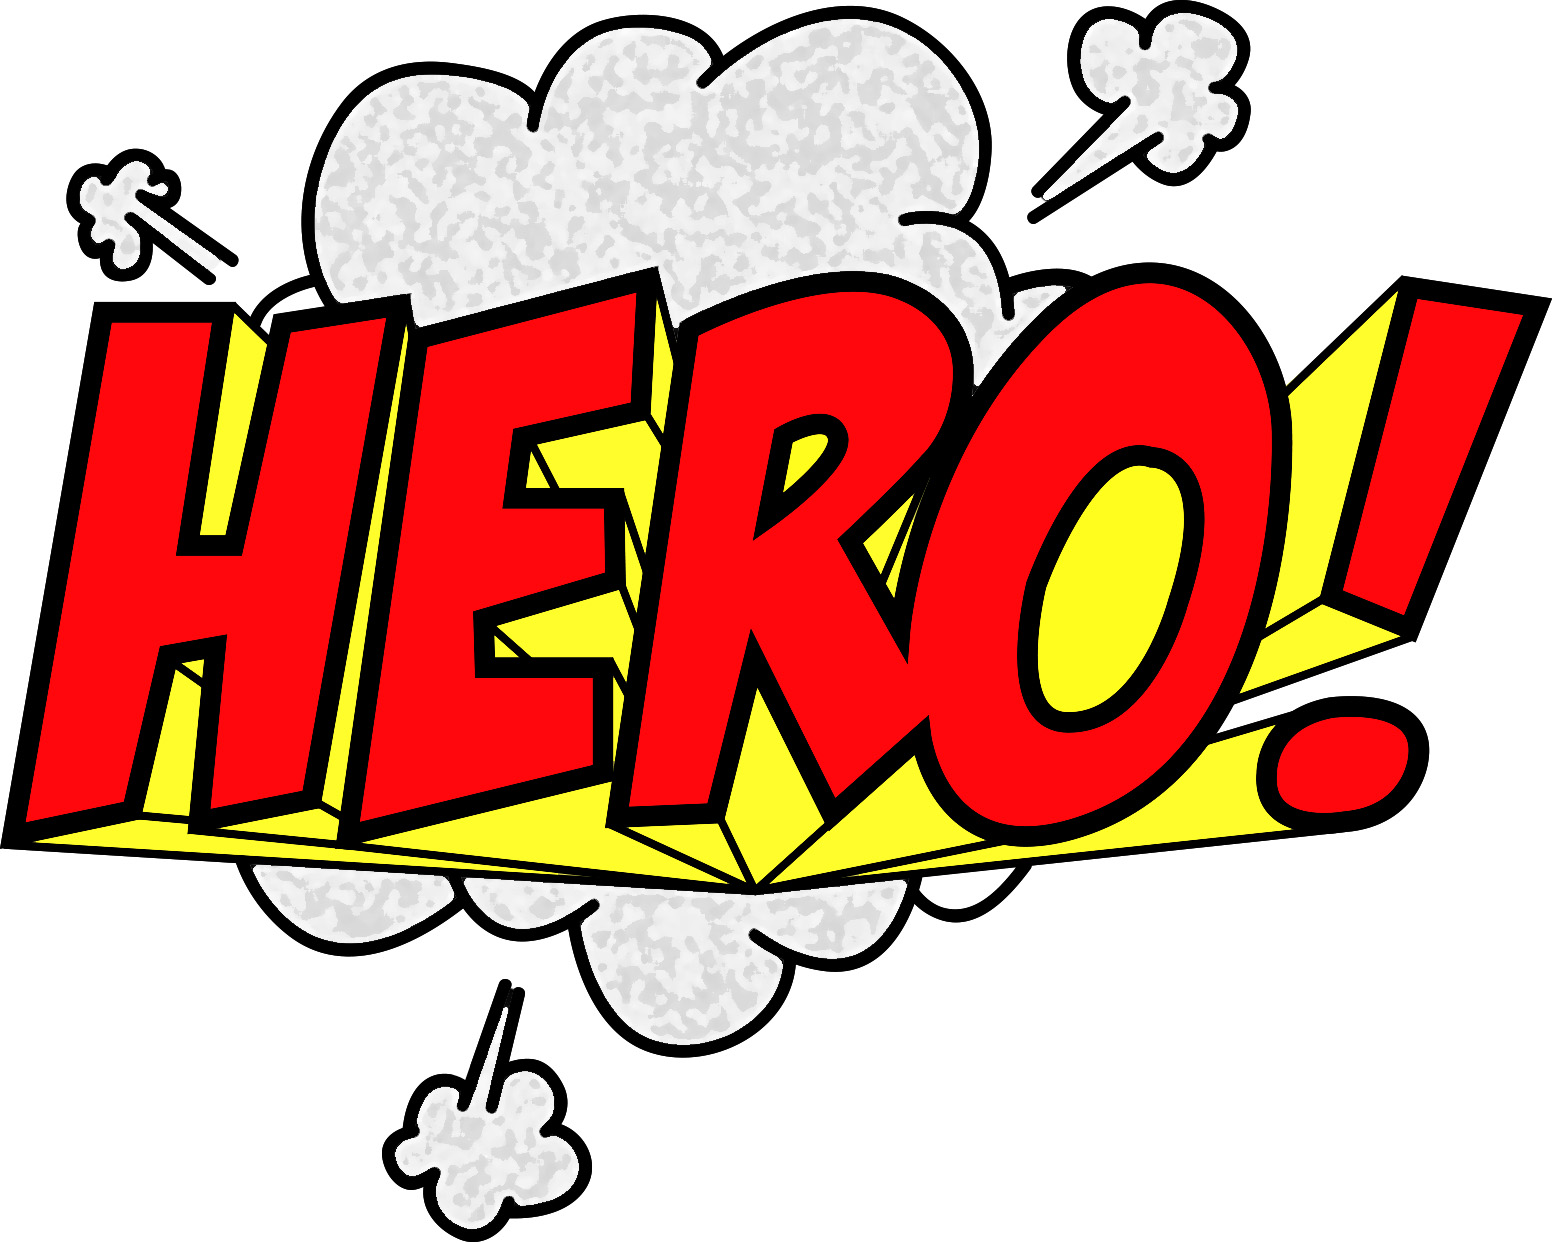 Superhero words clipart 5-Superhero words clipart 5-12